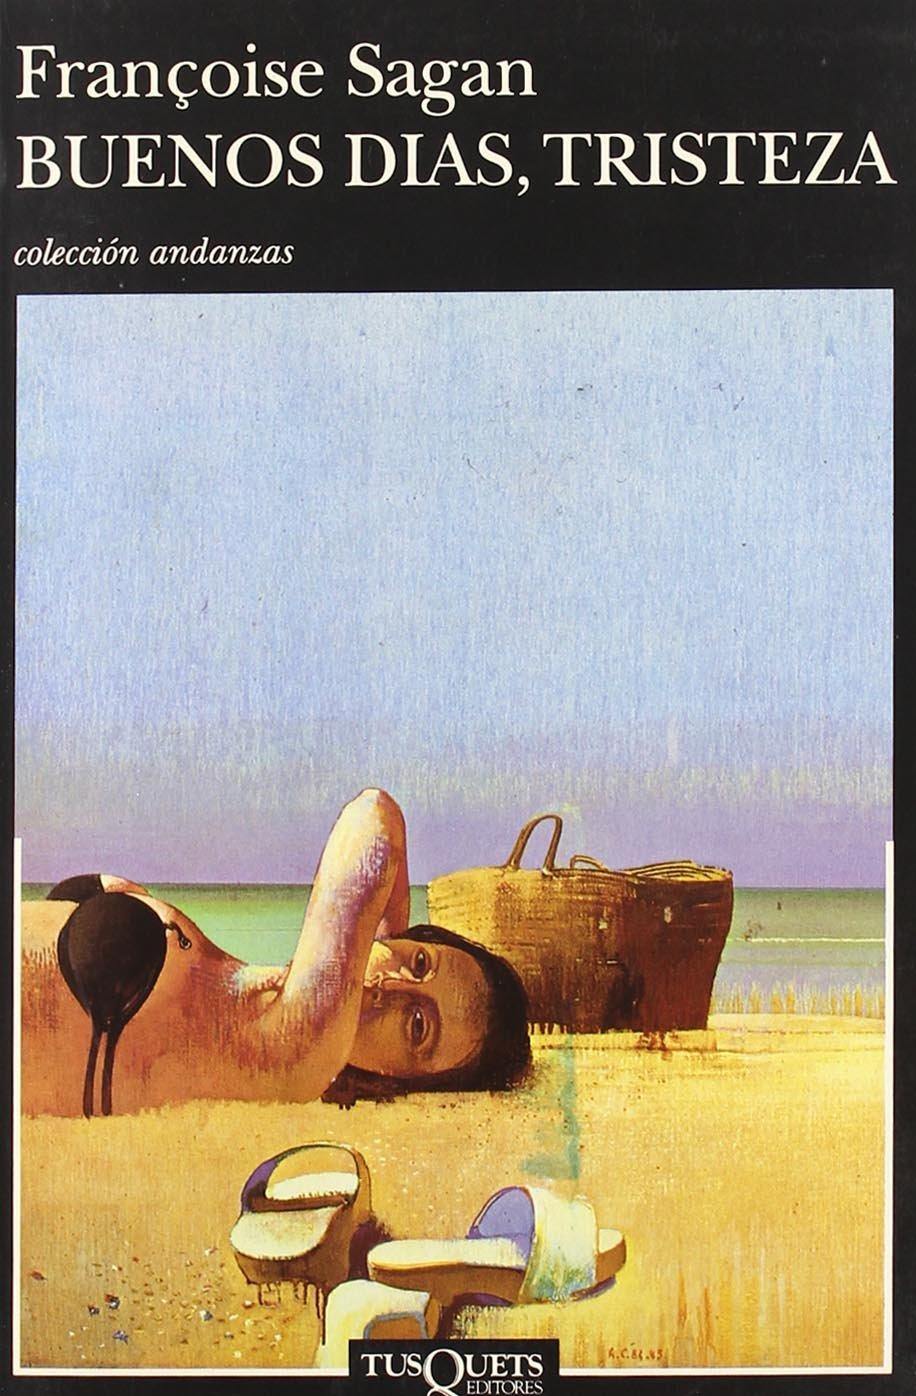 Buenos días tristeza - Novelas sobre el verano